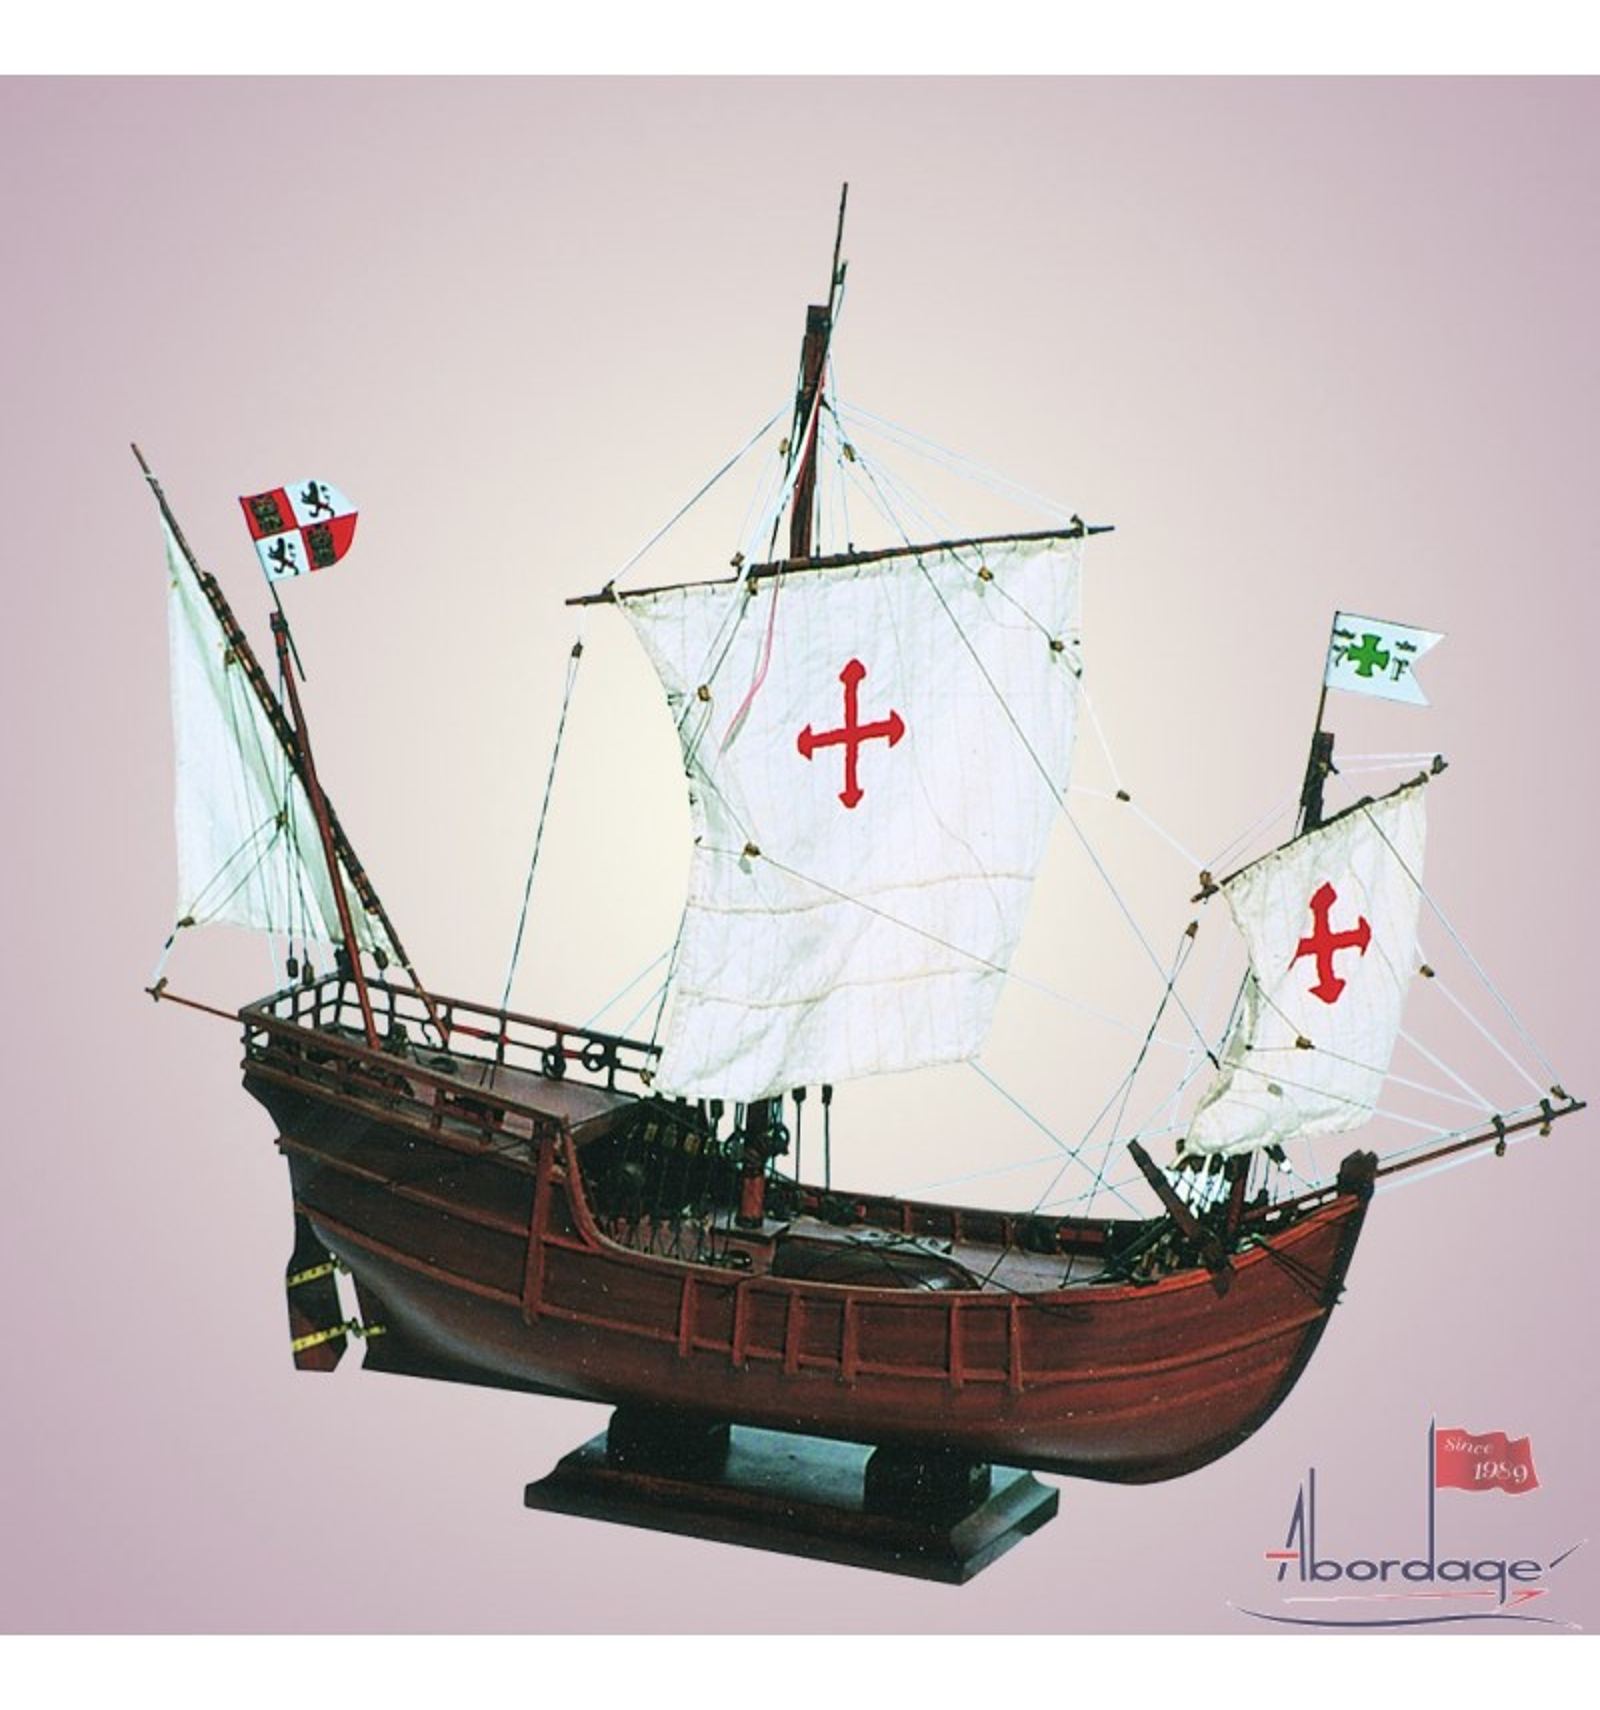 La Nia the smallest Caravel of Columbus  Quality Boat Model